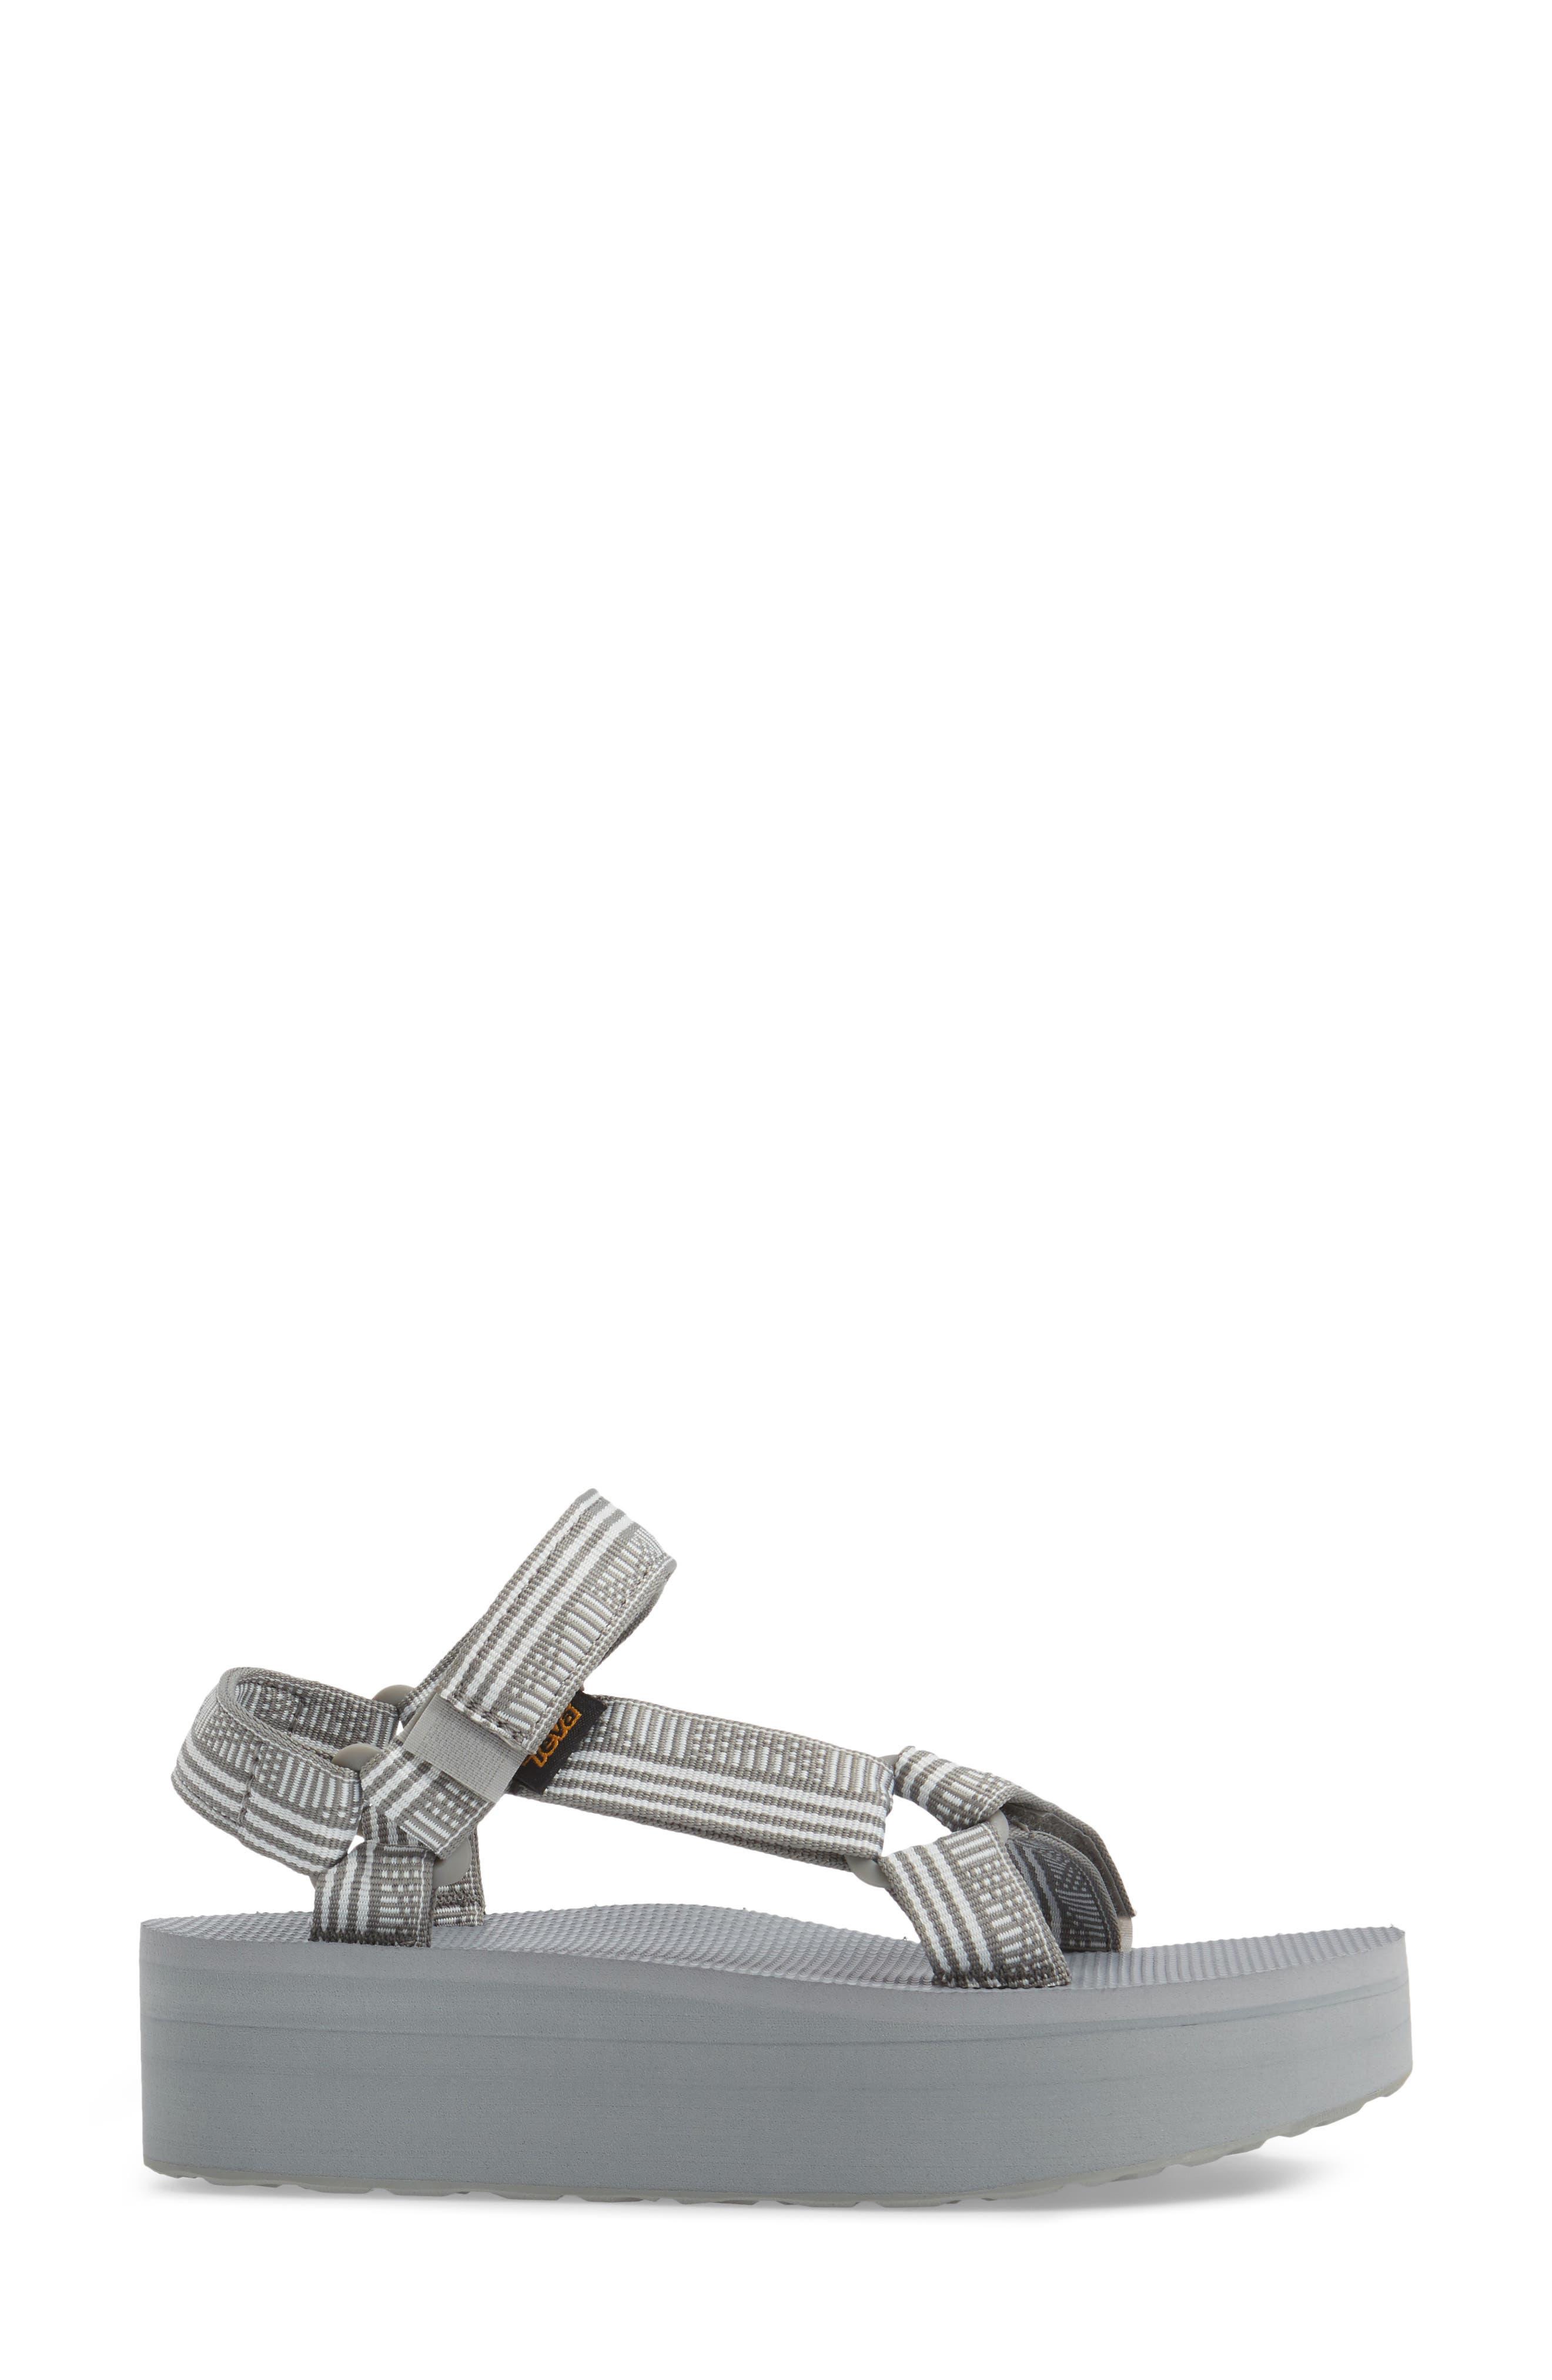 Alternate Image 3  - Teva 'Universal' Flatform Sandal (Women)